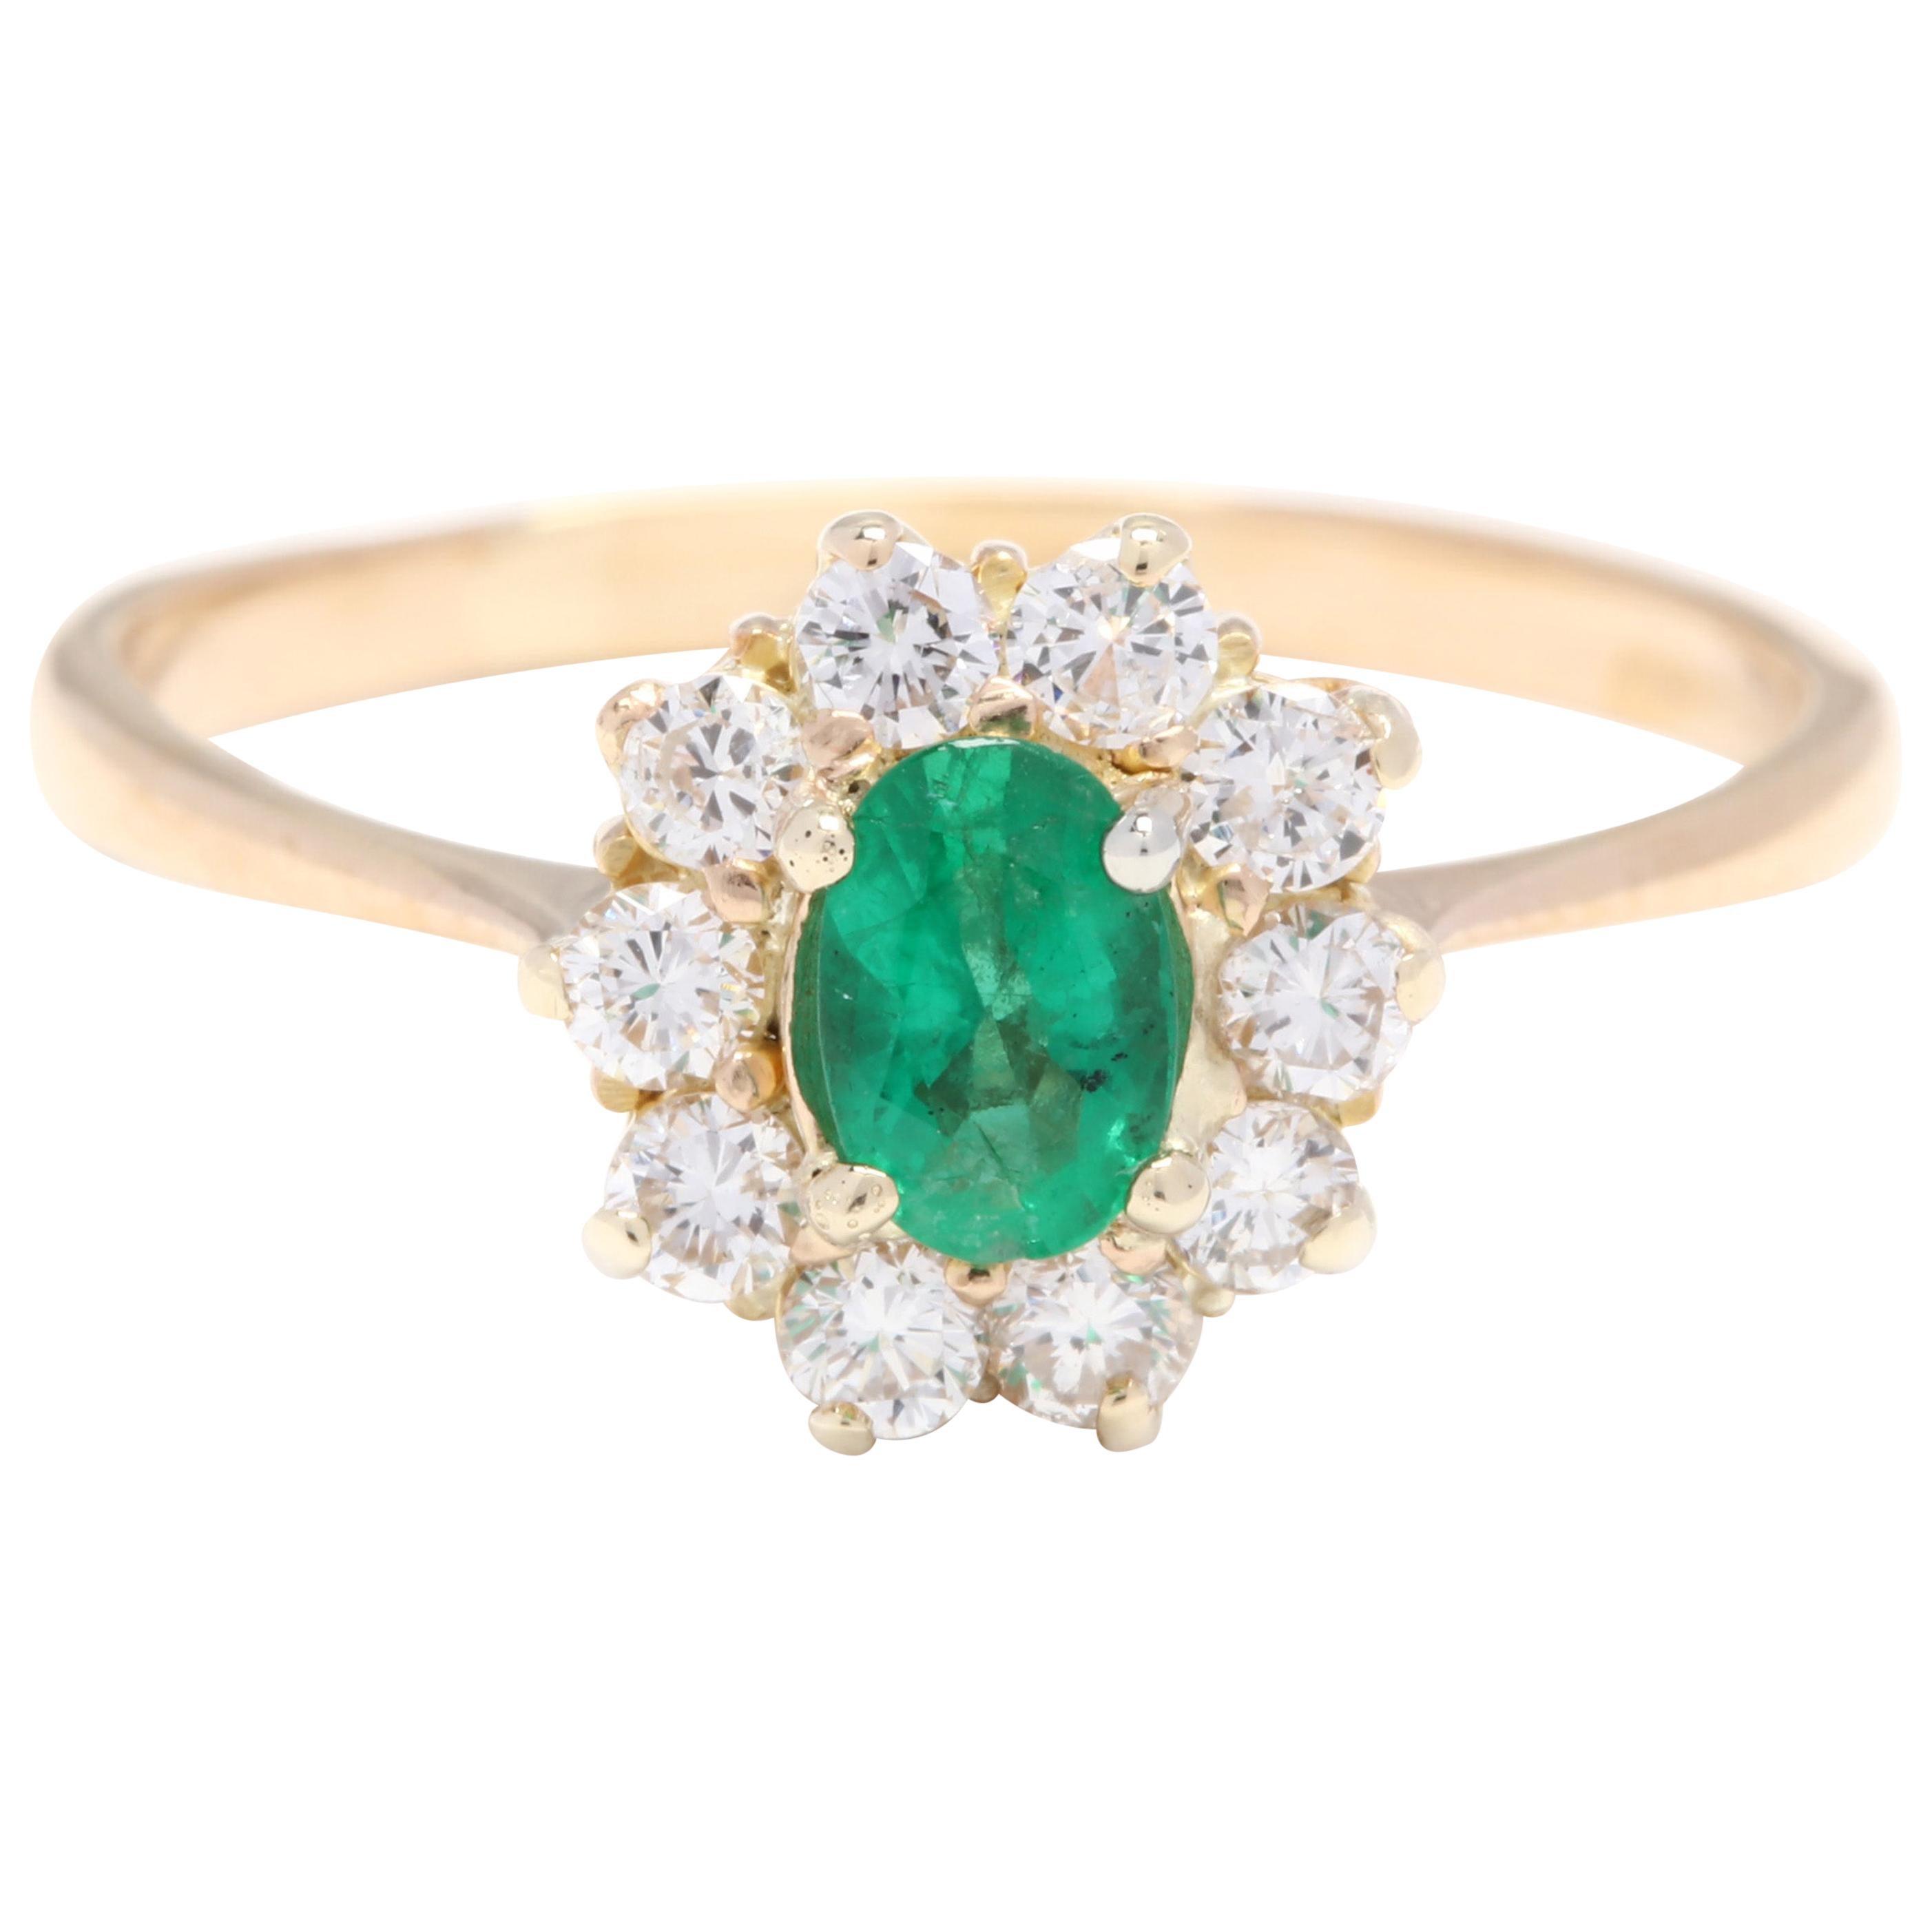 18 Karat Yellow Gold, Emerald and Diamond Halo Ring